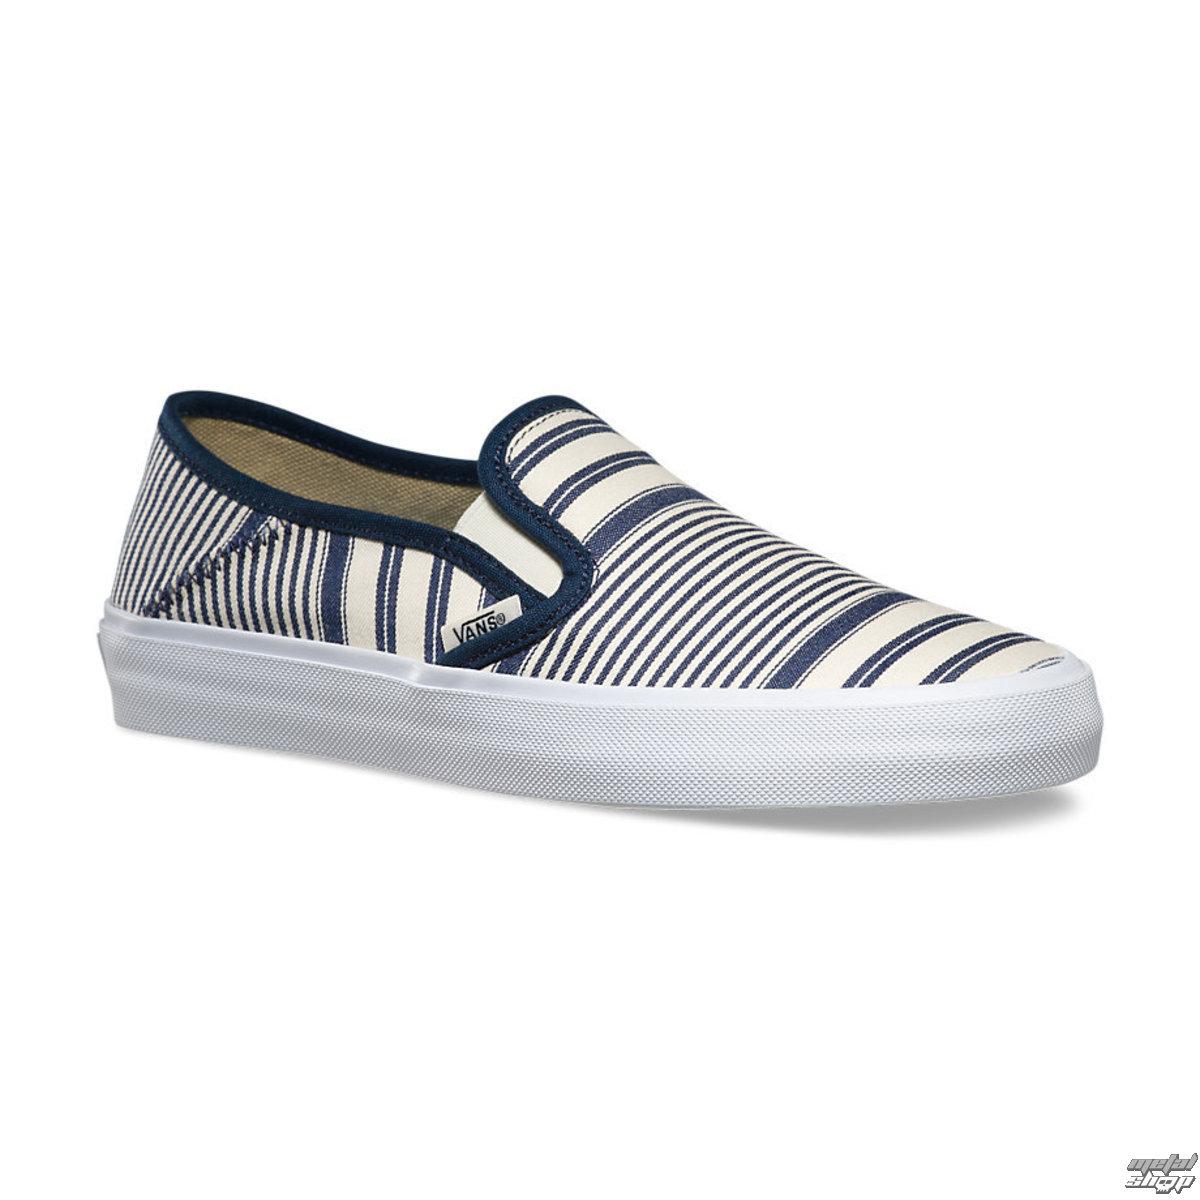 6db3b353347 topánky dámske VANS - Slip-On (Multi Stripe) - V19SIH2 - metalshop.sk